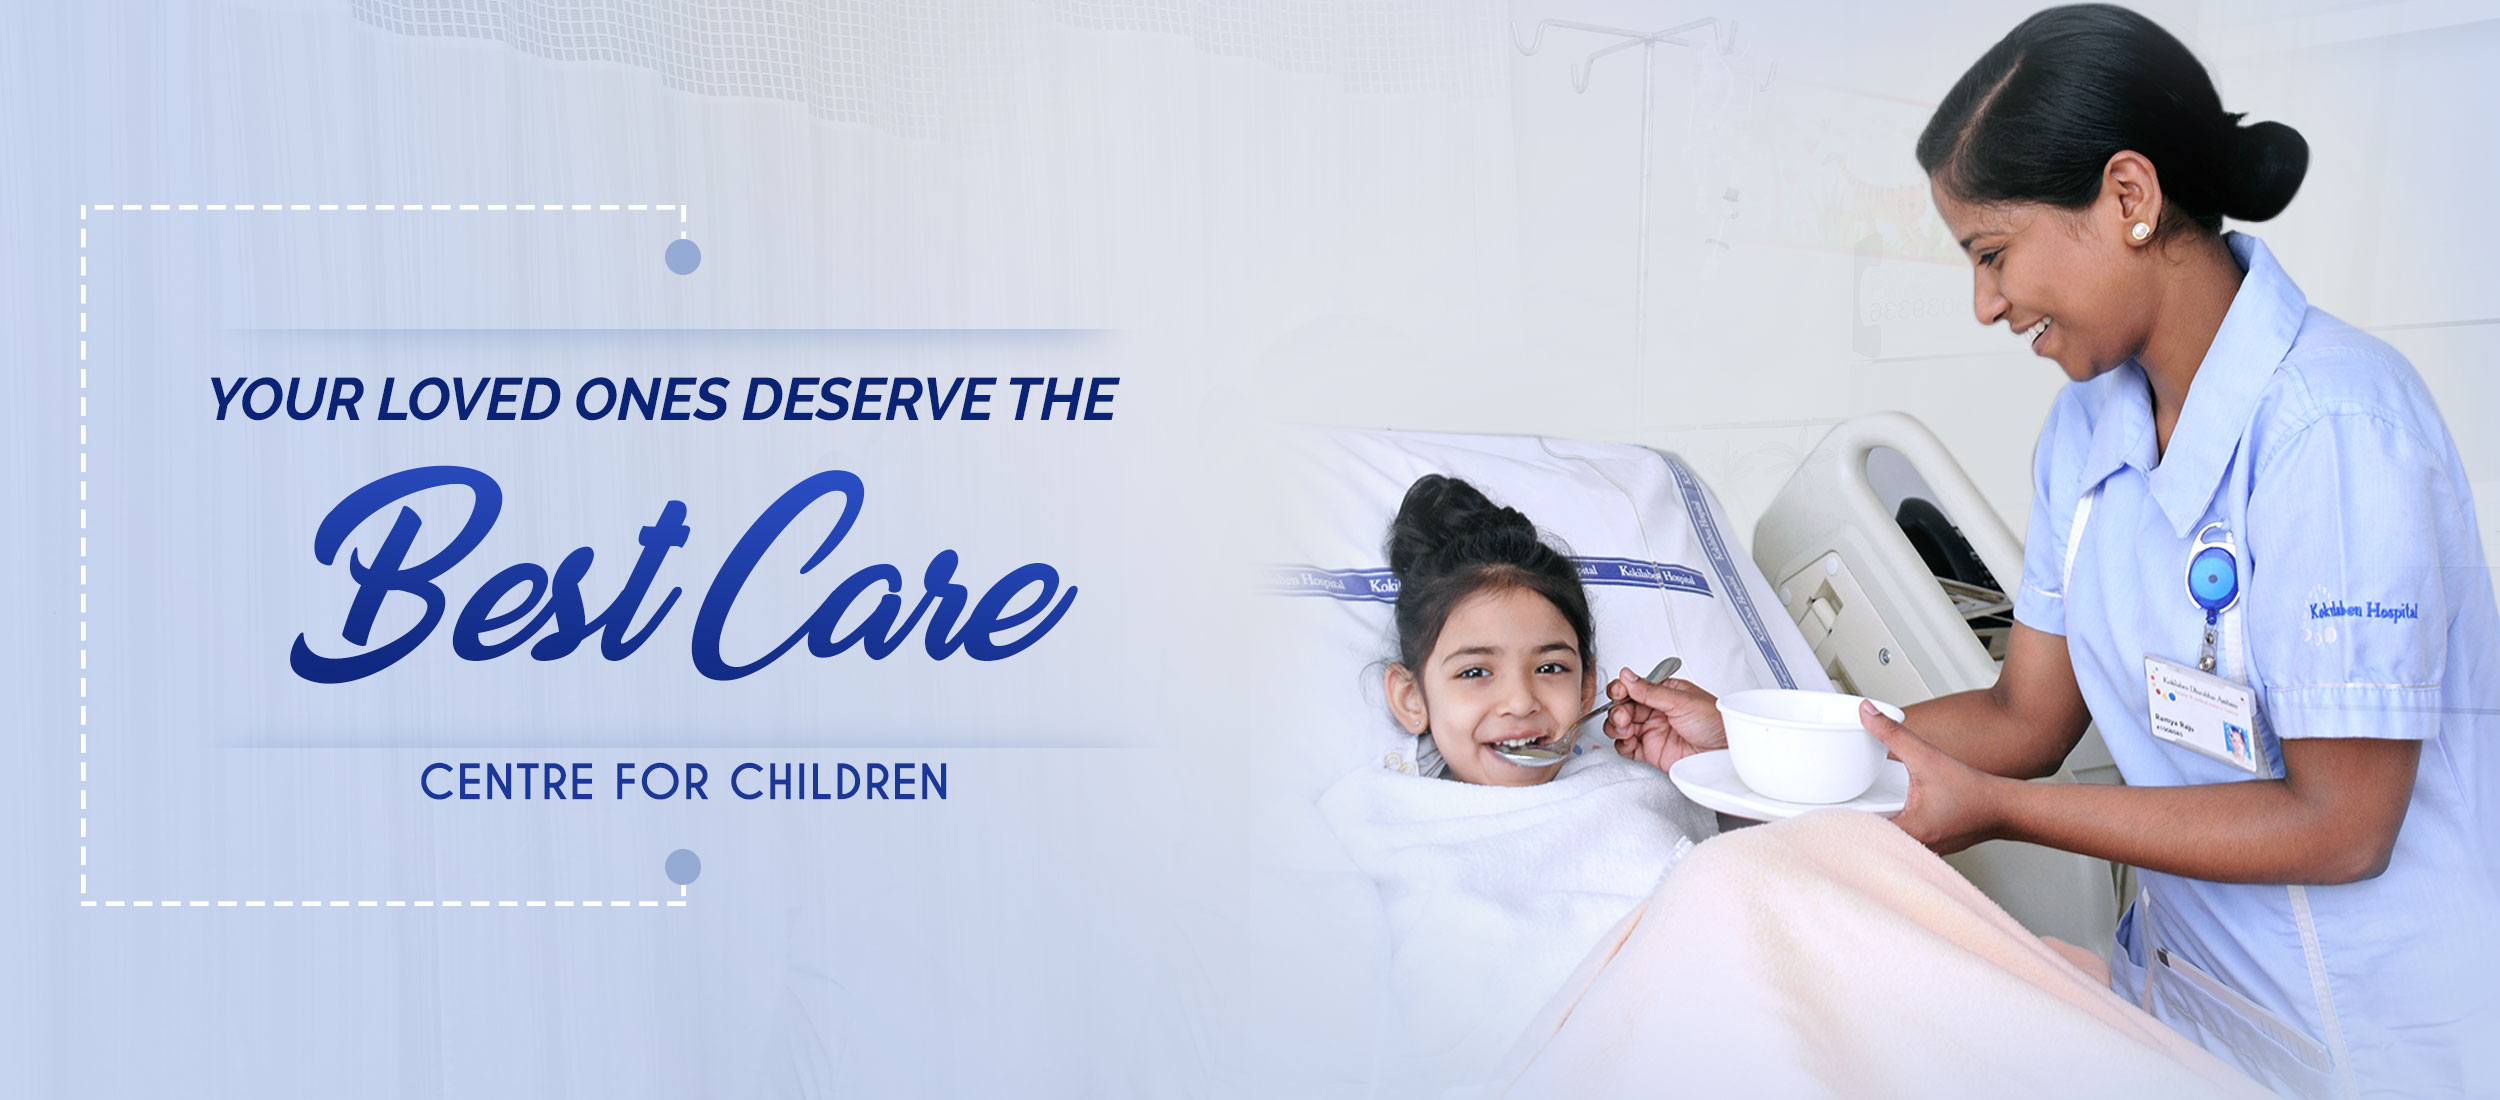 KDAH - Best Care Centre For Children